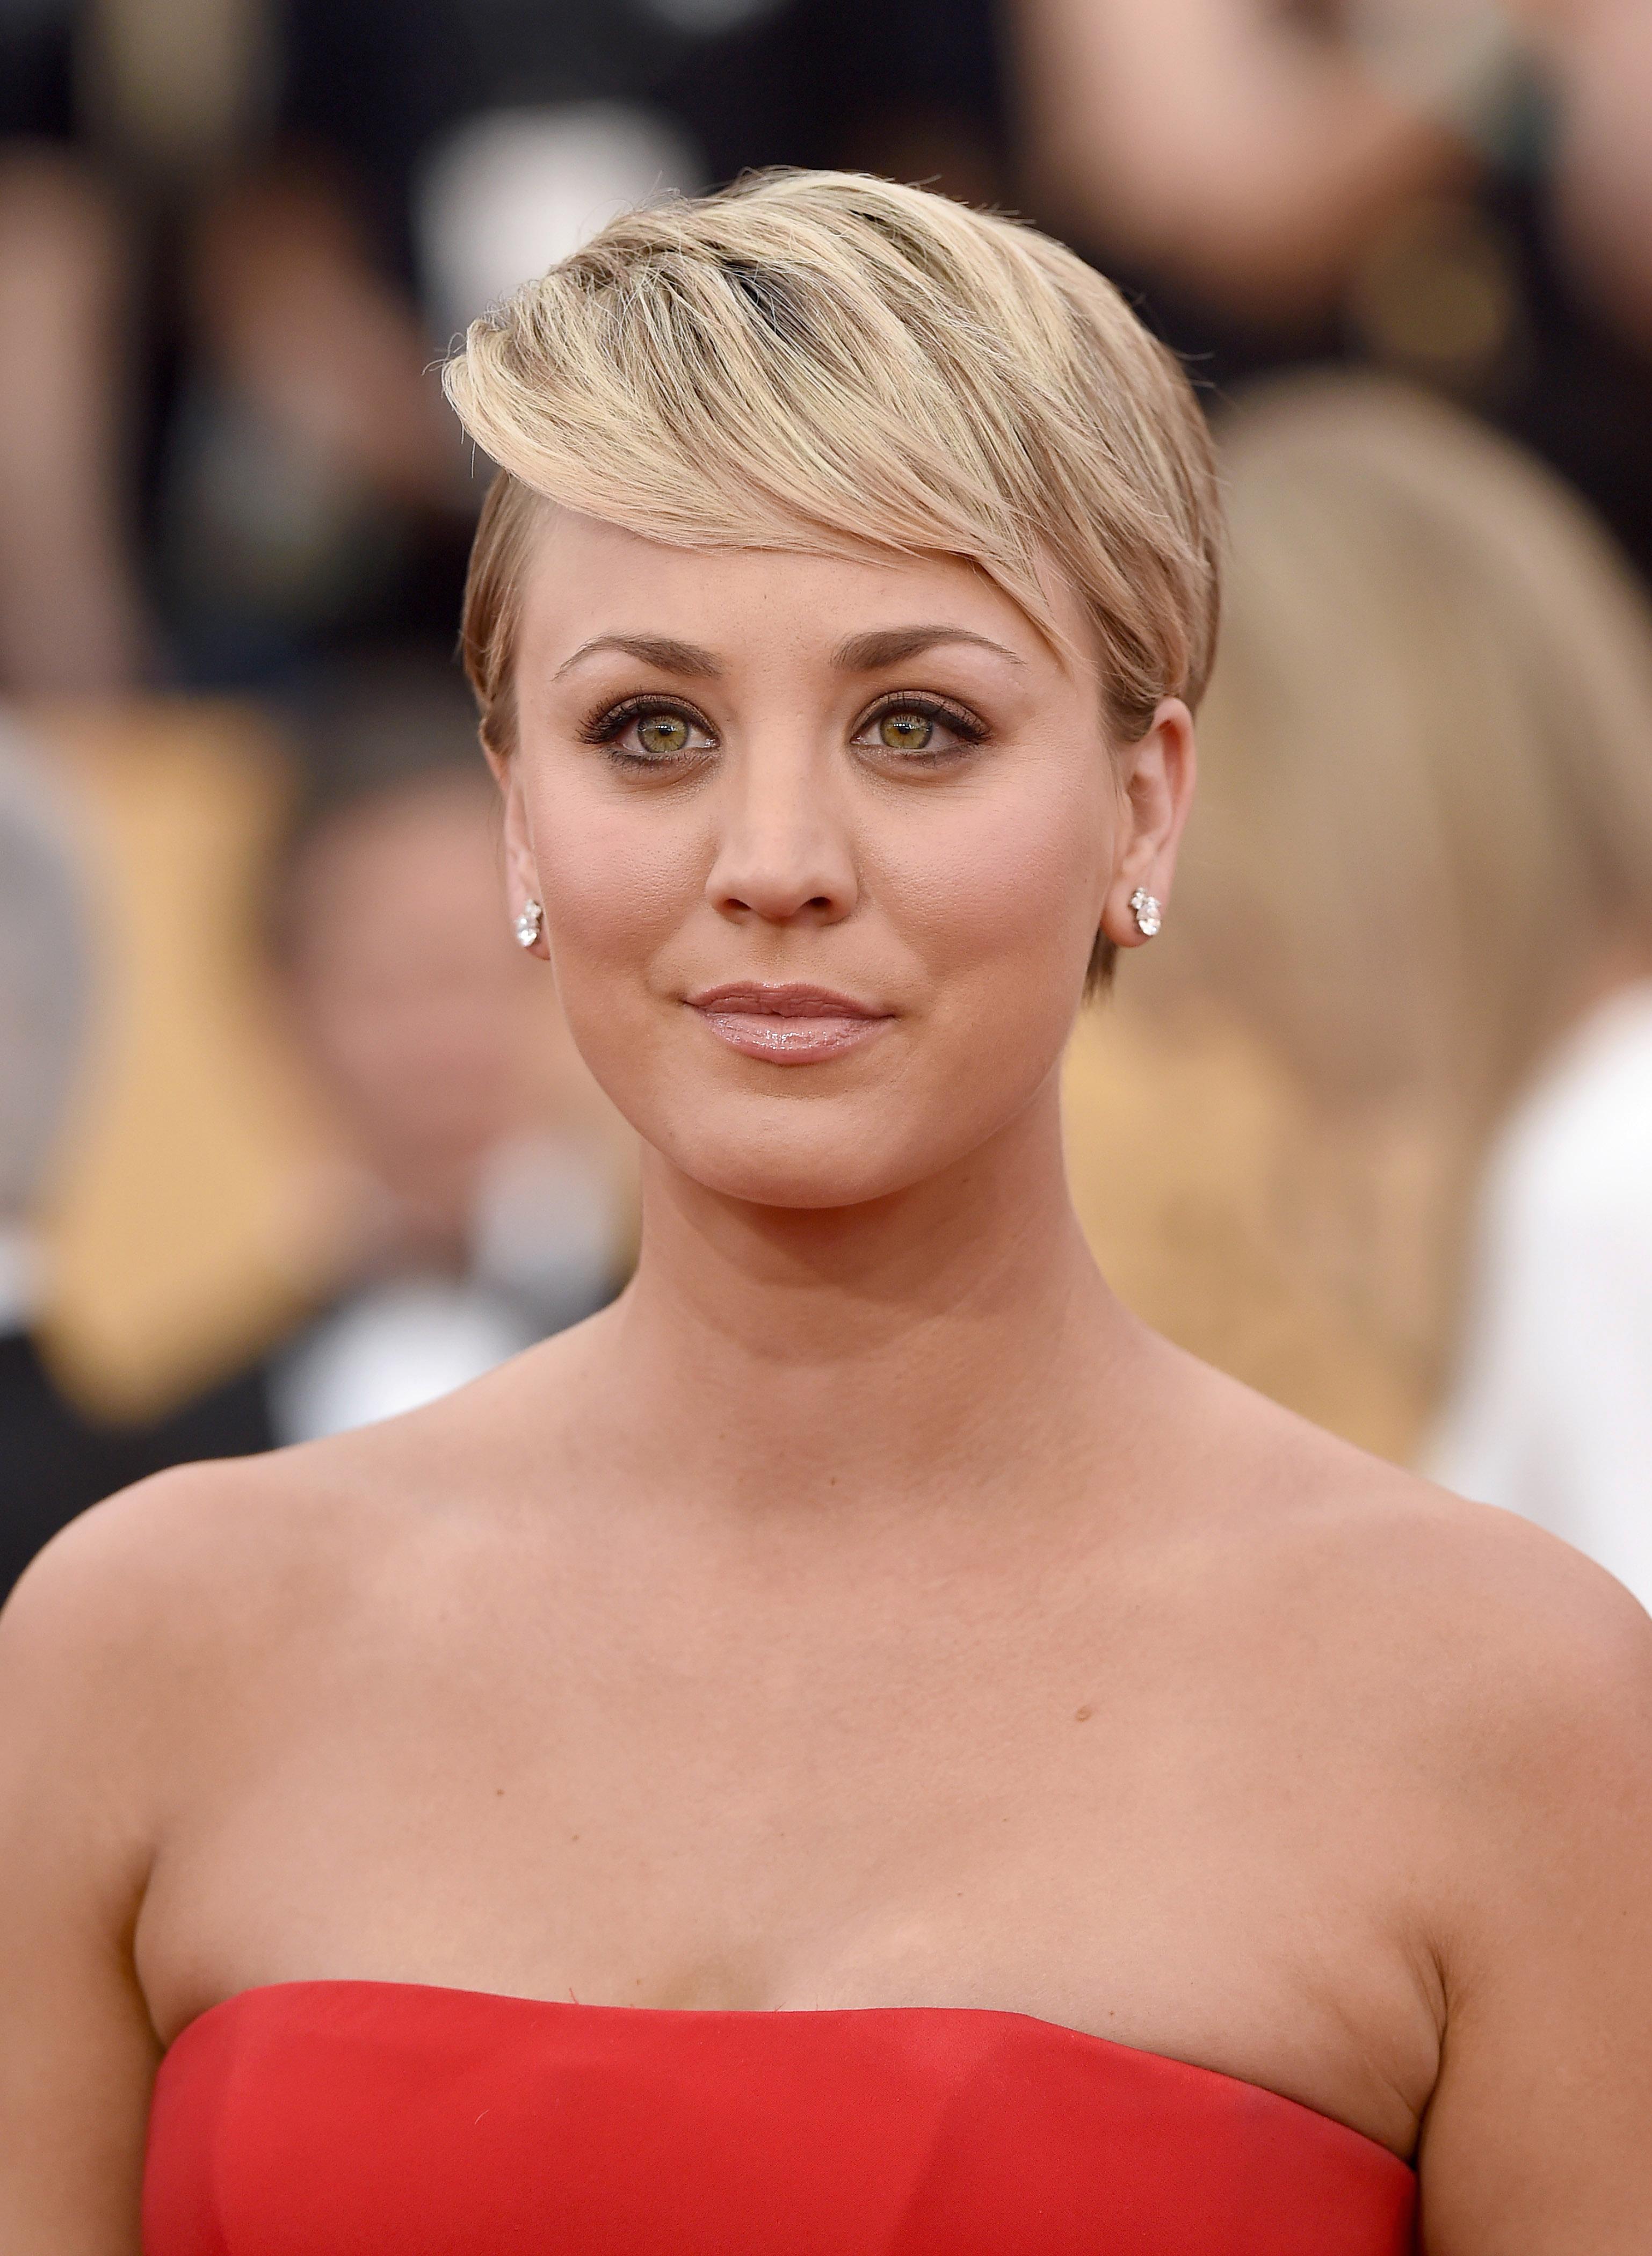 Astonishing 34 Pixie Hairstyles And Cuts Celebrities With Pixies Short Hairstyles Gunalazisus